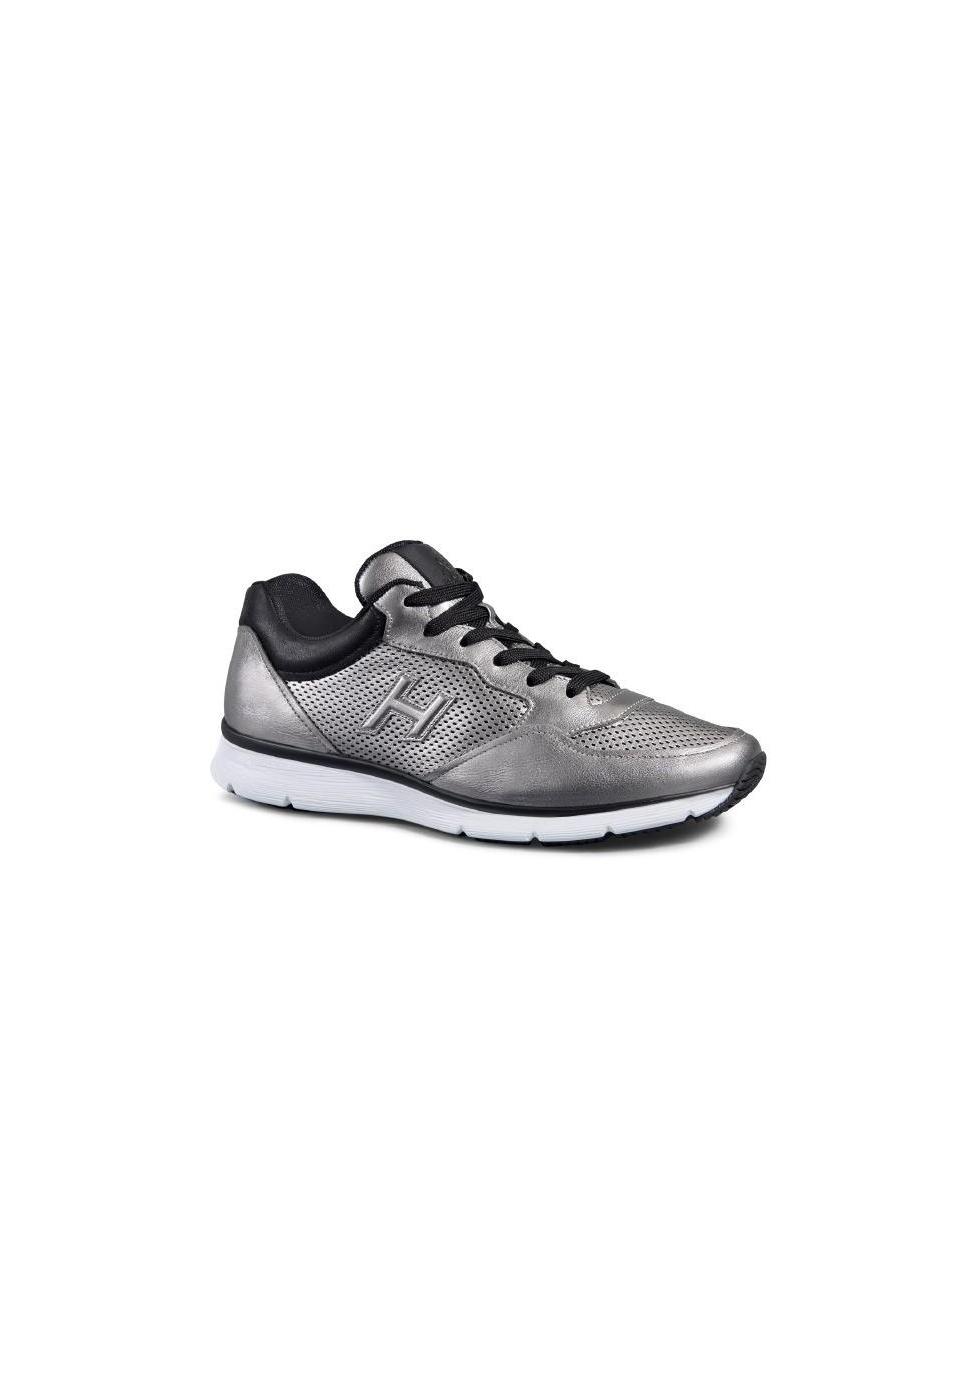 Slip on Sneakers for Men On Sale, Black, Leather, 2017, 6 Hogan